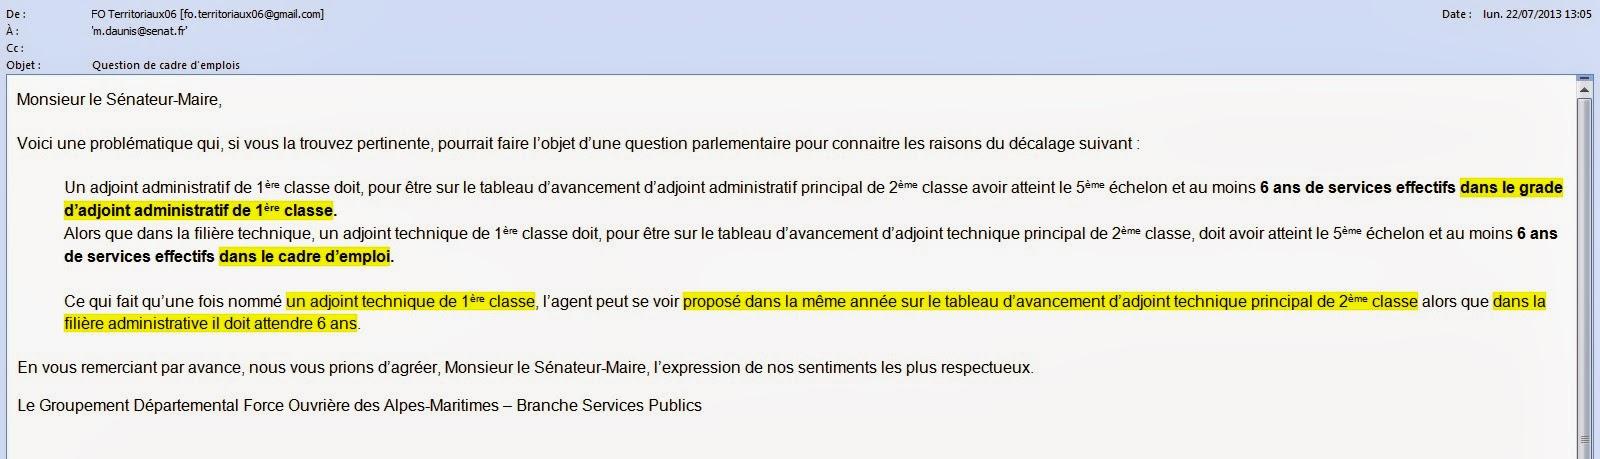 Syndicat force ouvri re des agents territoriaux des alpes - Grille indiciaire adjoint administratif 2014 ...